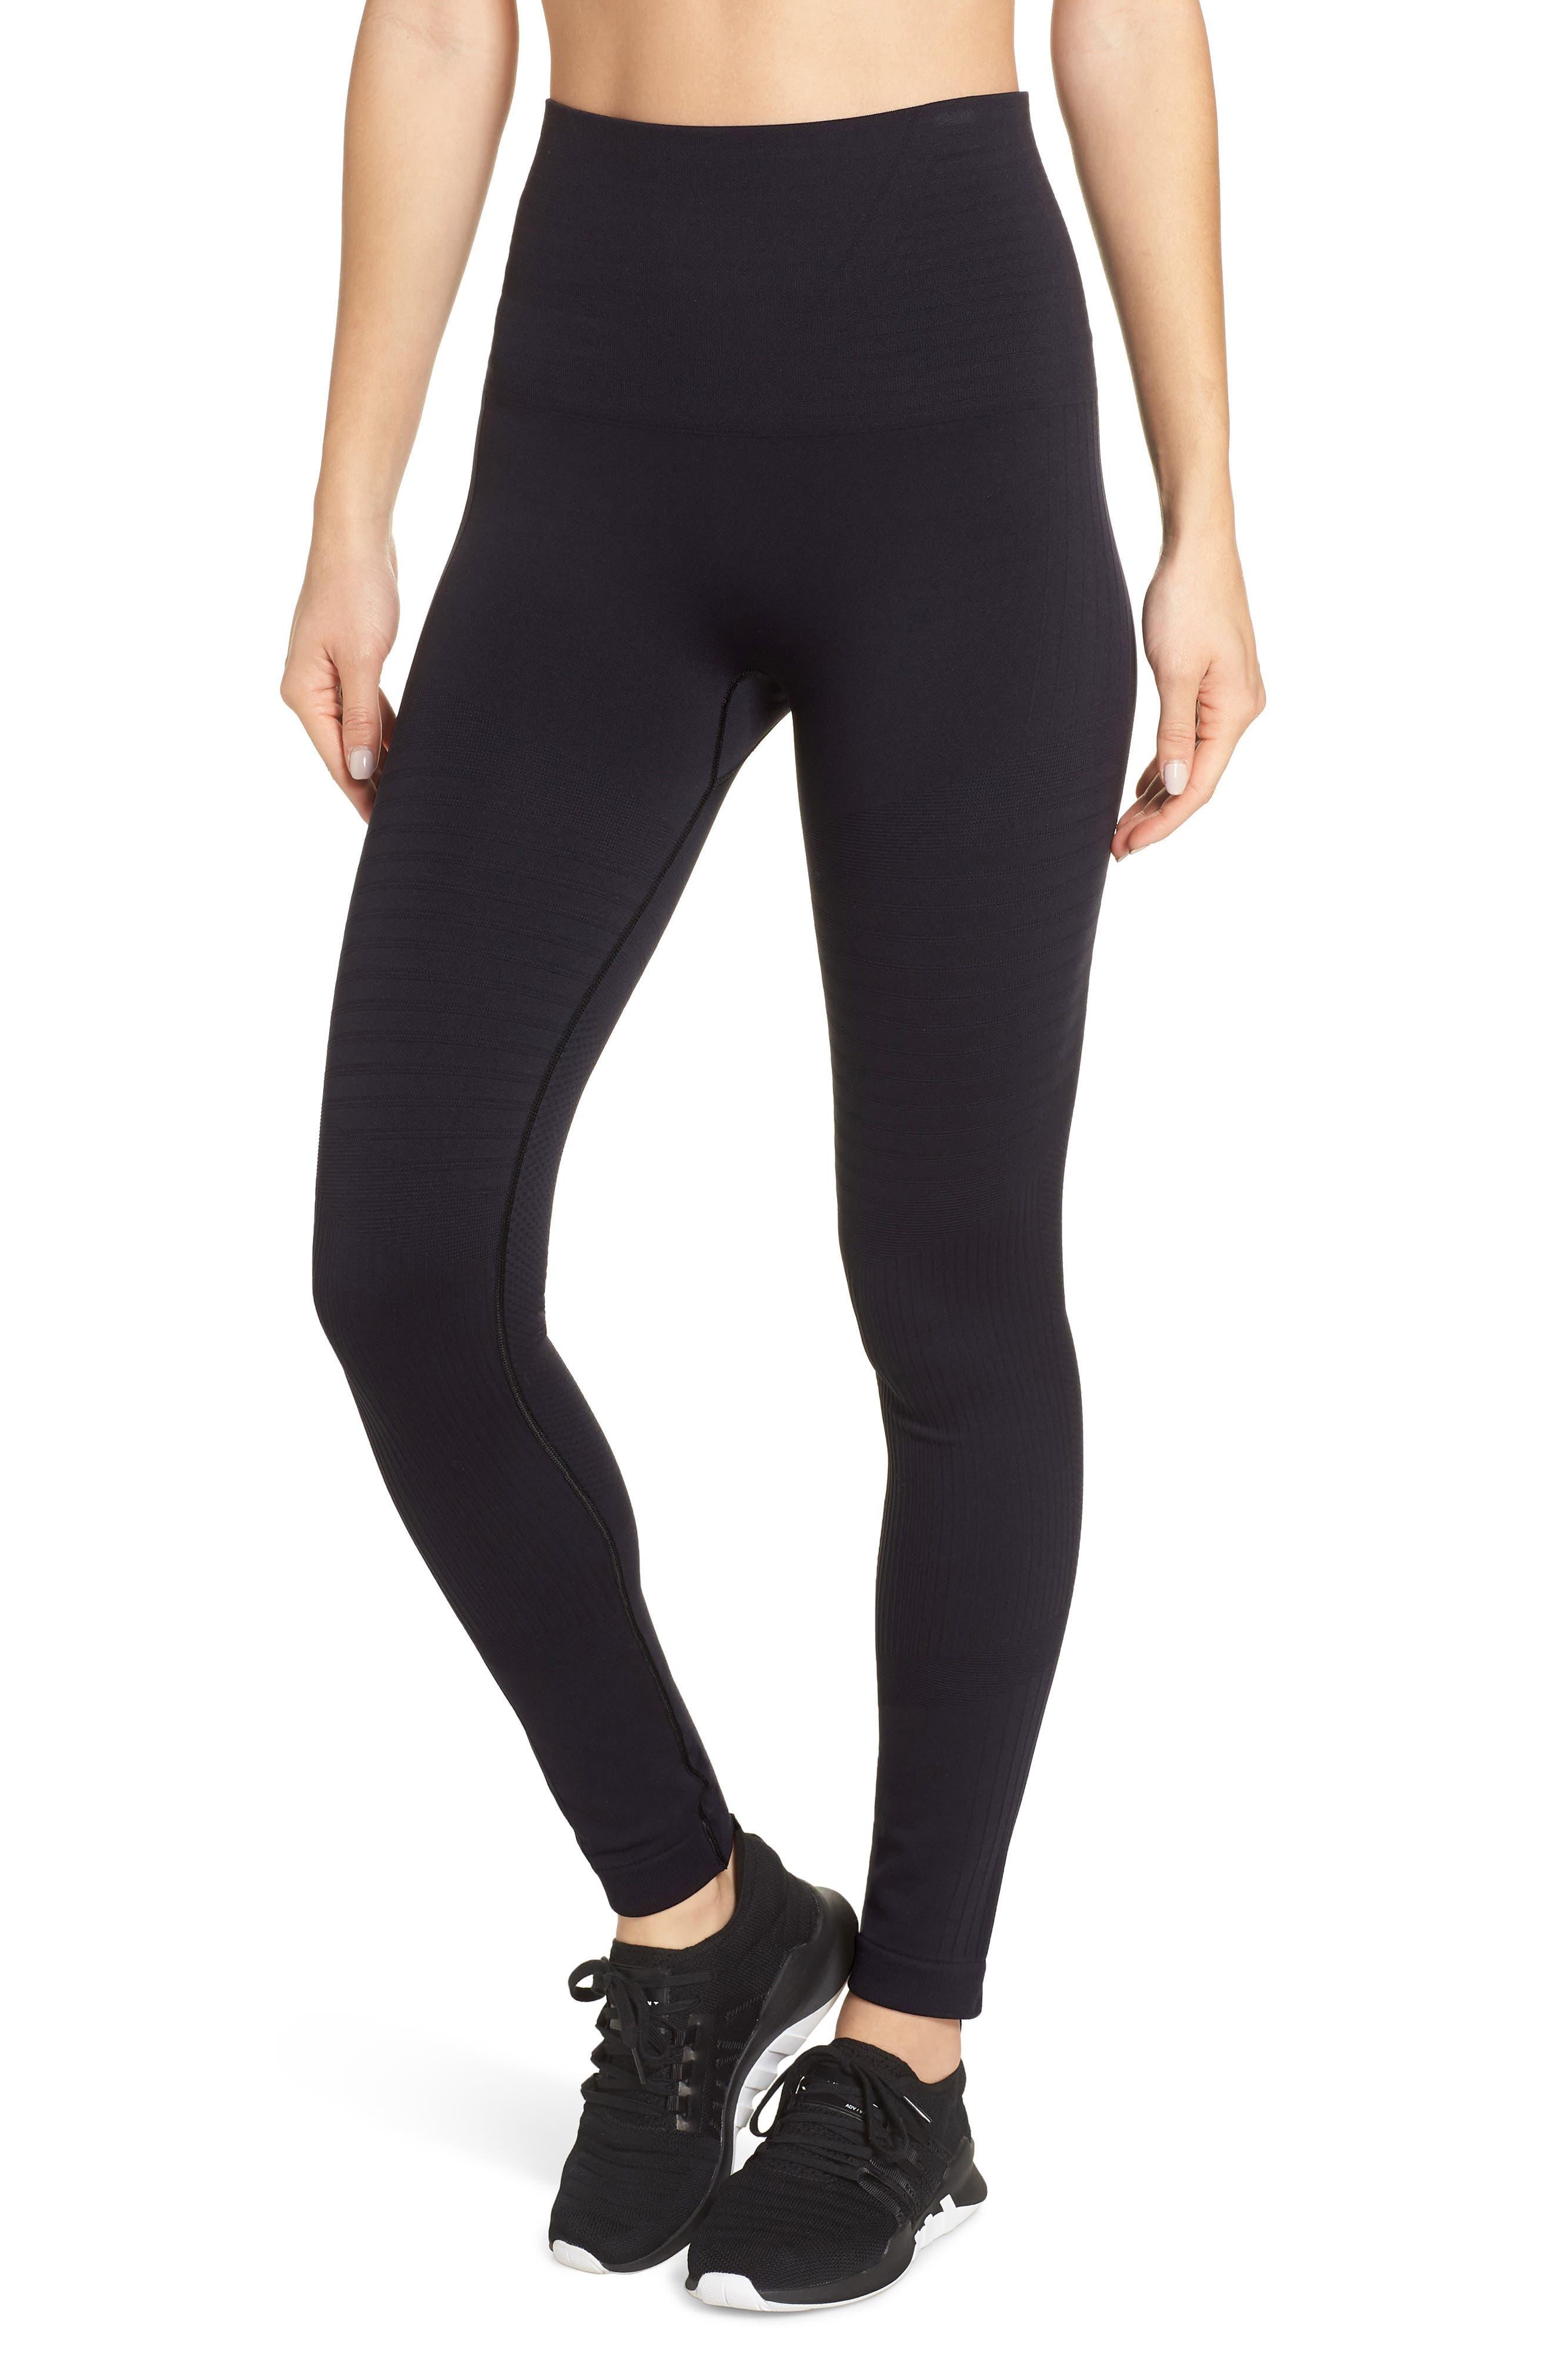 Moto Seamless High Waist Leggings,                         Main,                         color, BLACK